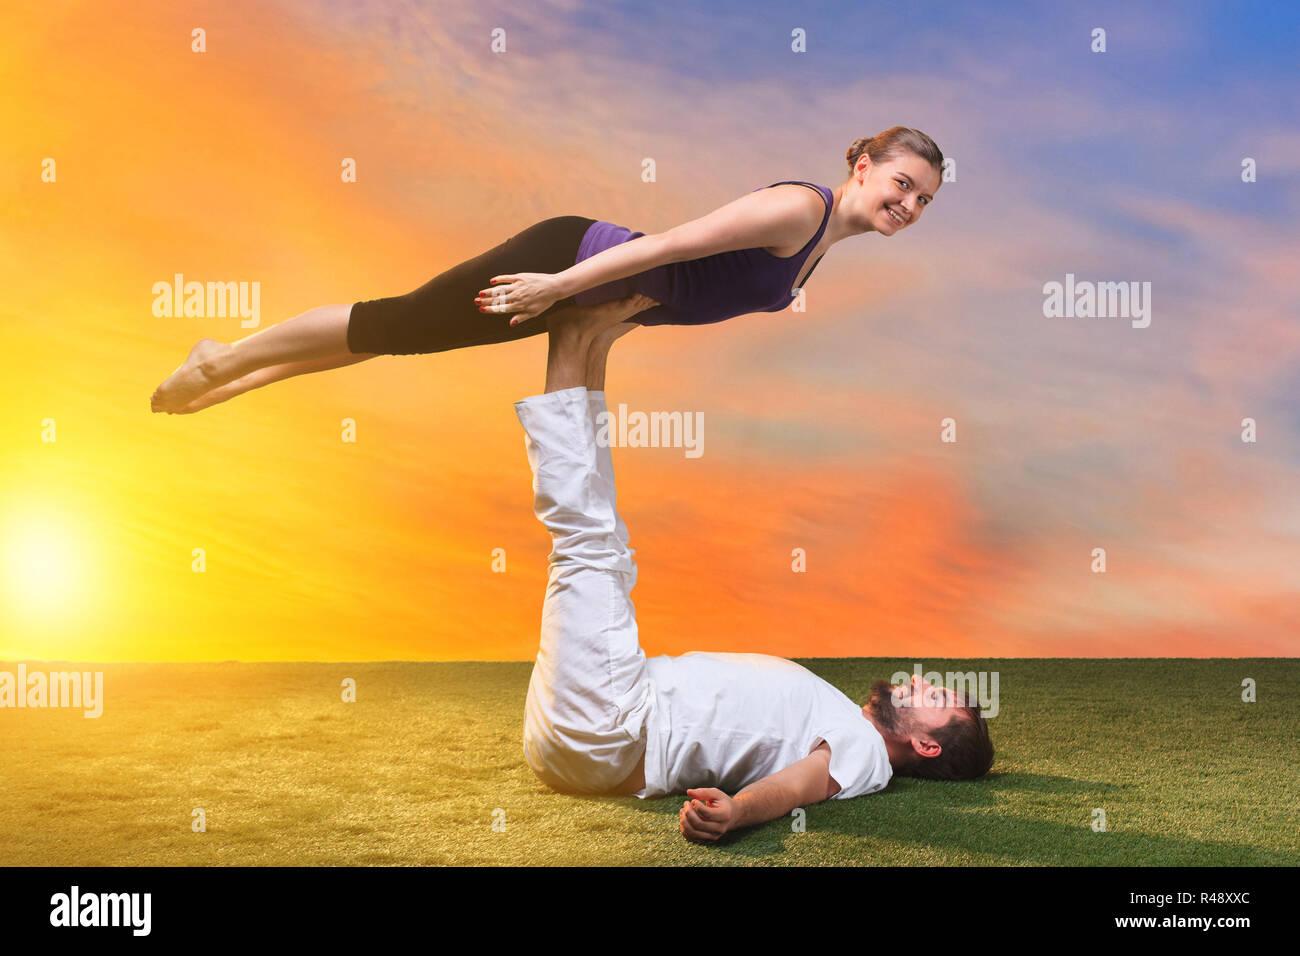 The Two People Doing Yoga Exercises Stock Photo Alamy